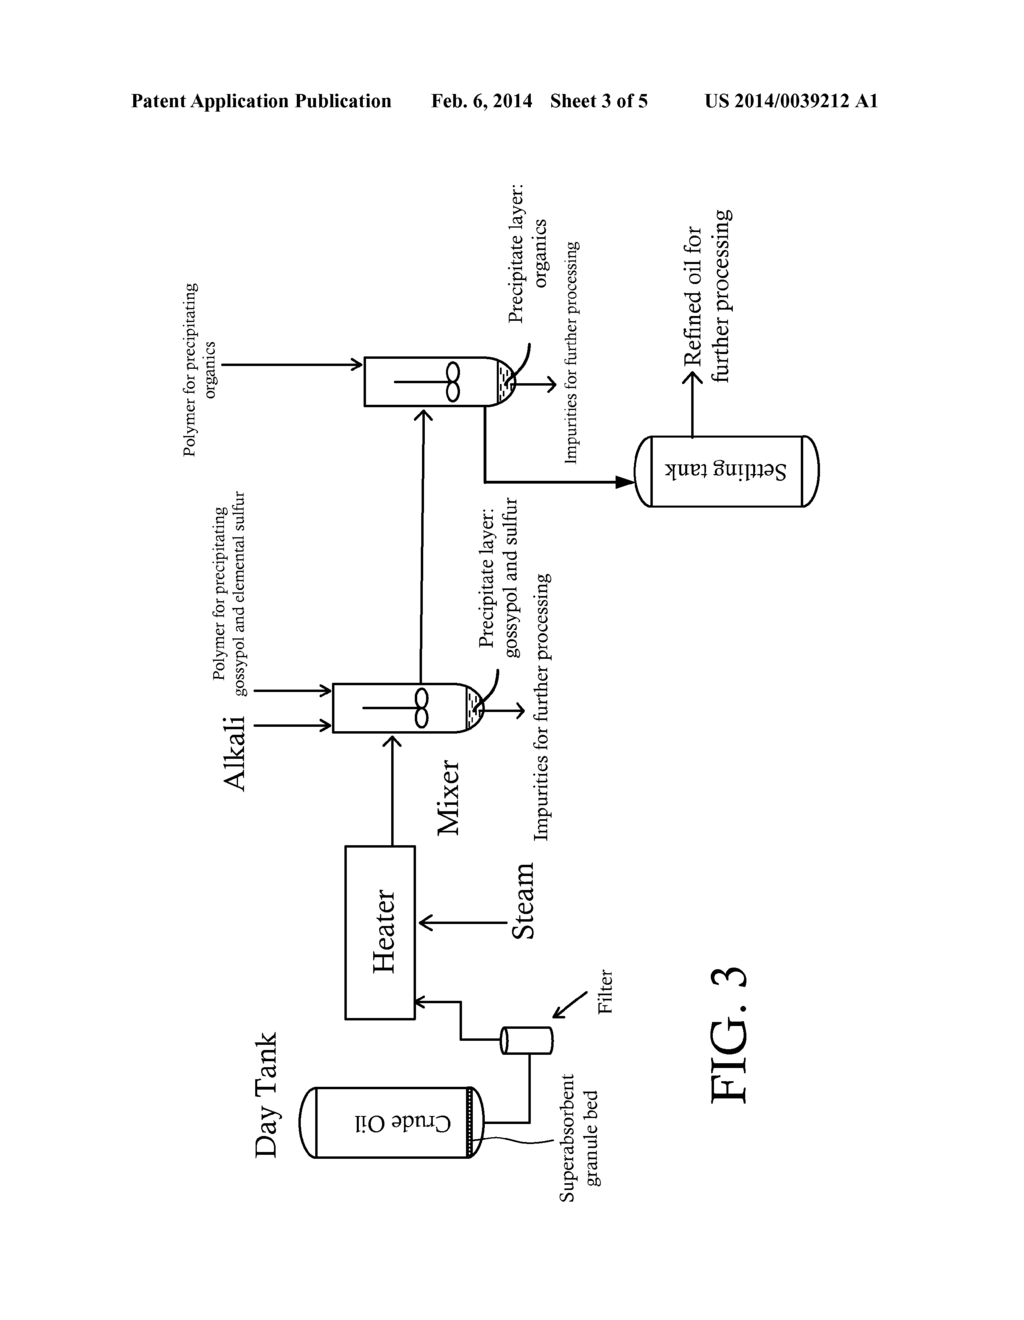 Oil Refinery Schematic Diagram. . Wiring Diagram on